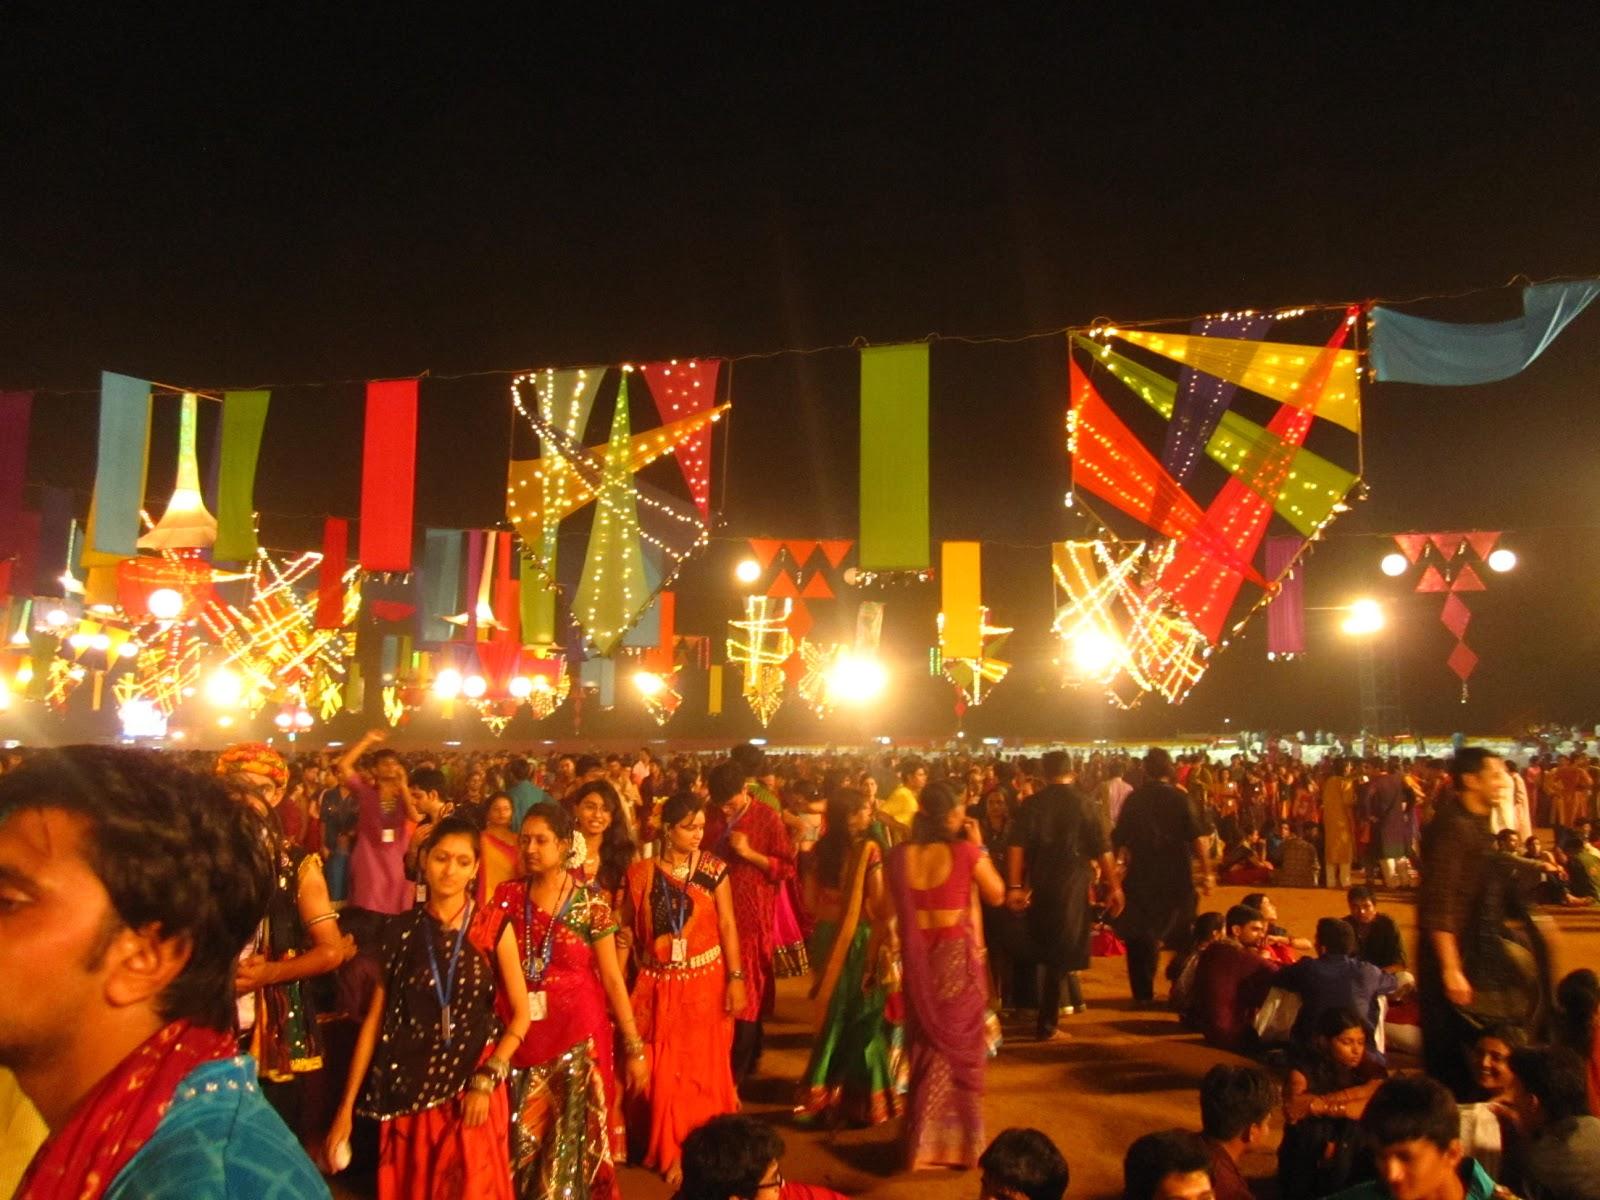 essay my favourite festival navratri My favorite festival diwali : essay, history, article, importance my favorite festival diwali:india is a country of festivals where almost all.